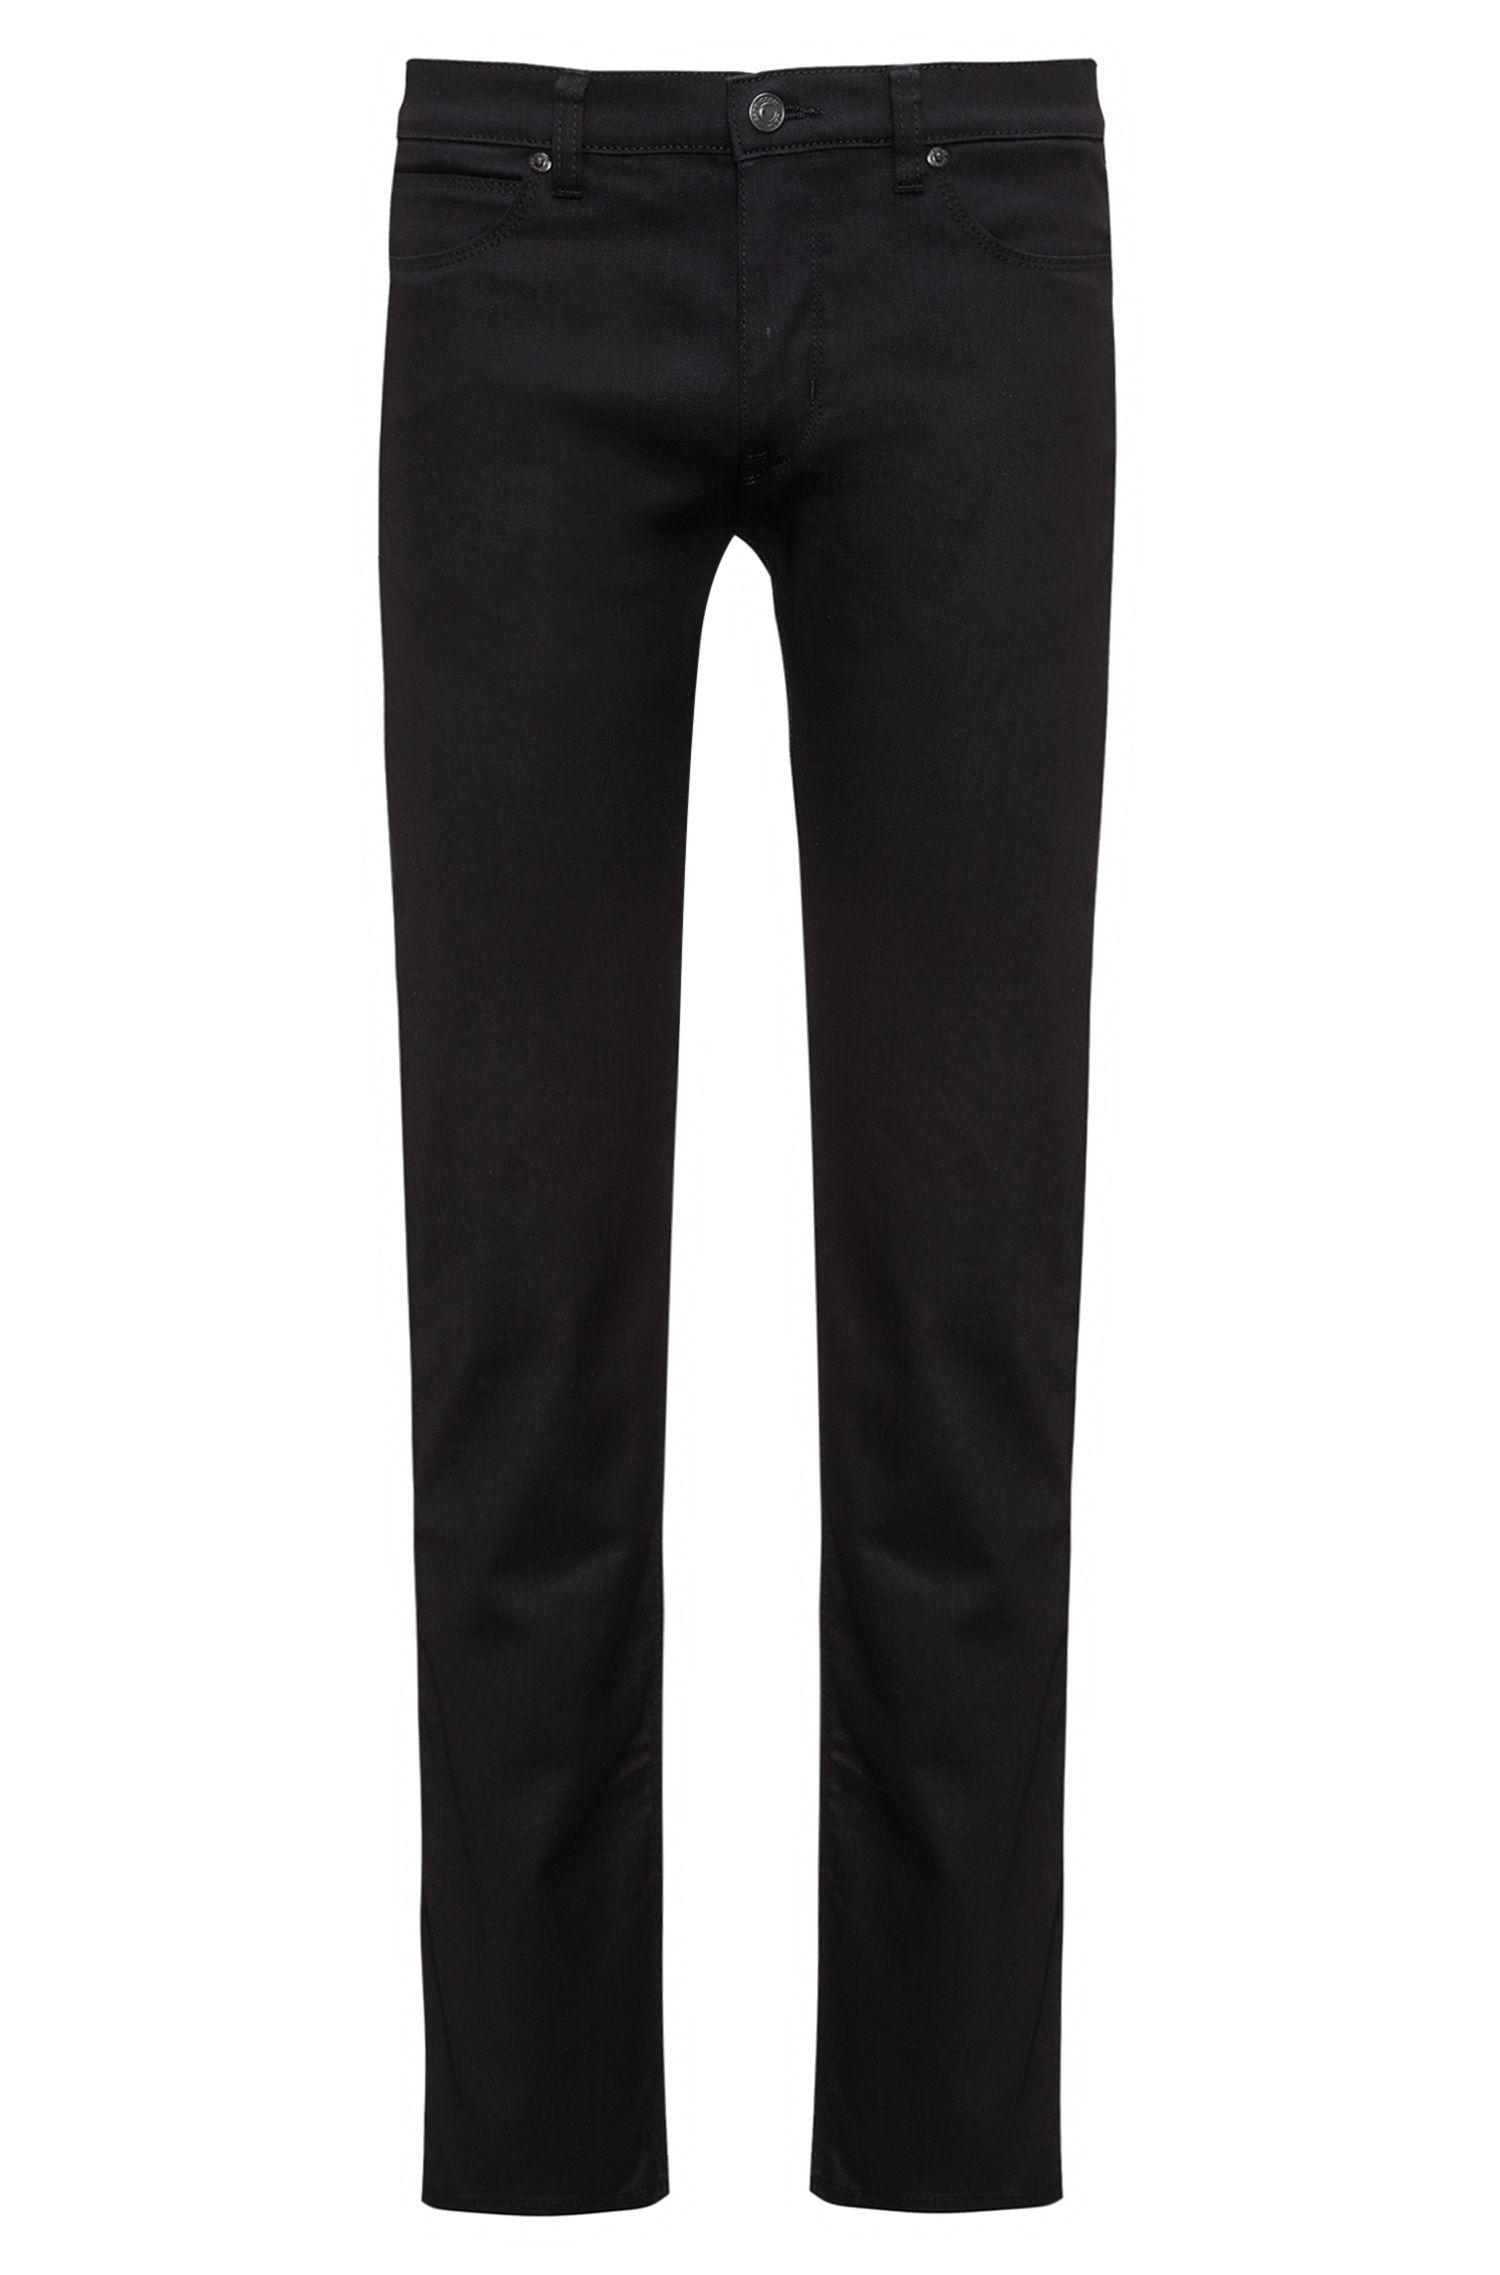 Slim-fit jeans in stay-black denim by HUGO Man